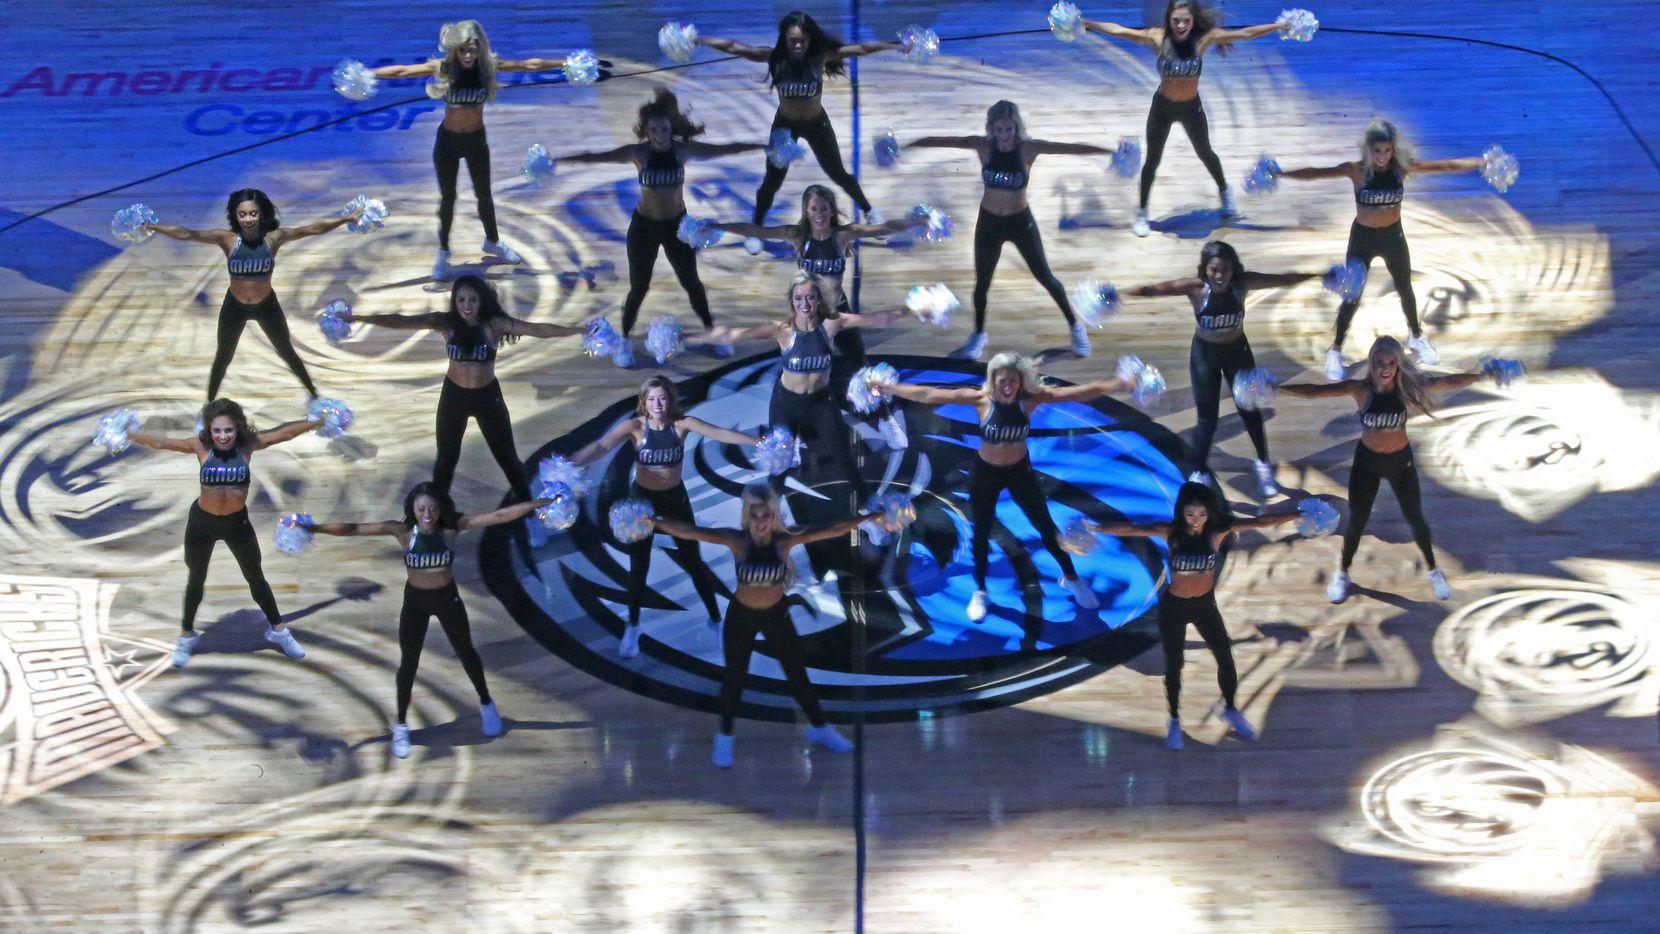 The Dallas Mavericks Dancers perform before the Orlando Magic vs. the Dallas Mavericks NBA basketball game at the American Airlines Center in Dallas on Tuesday, January 9, 2018. (Louis DeLuca/The Dallas Morning News)